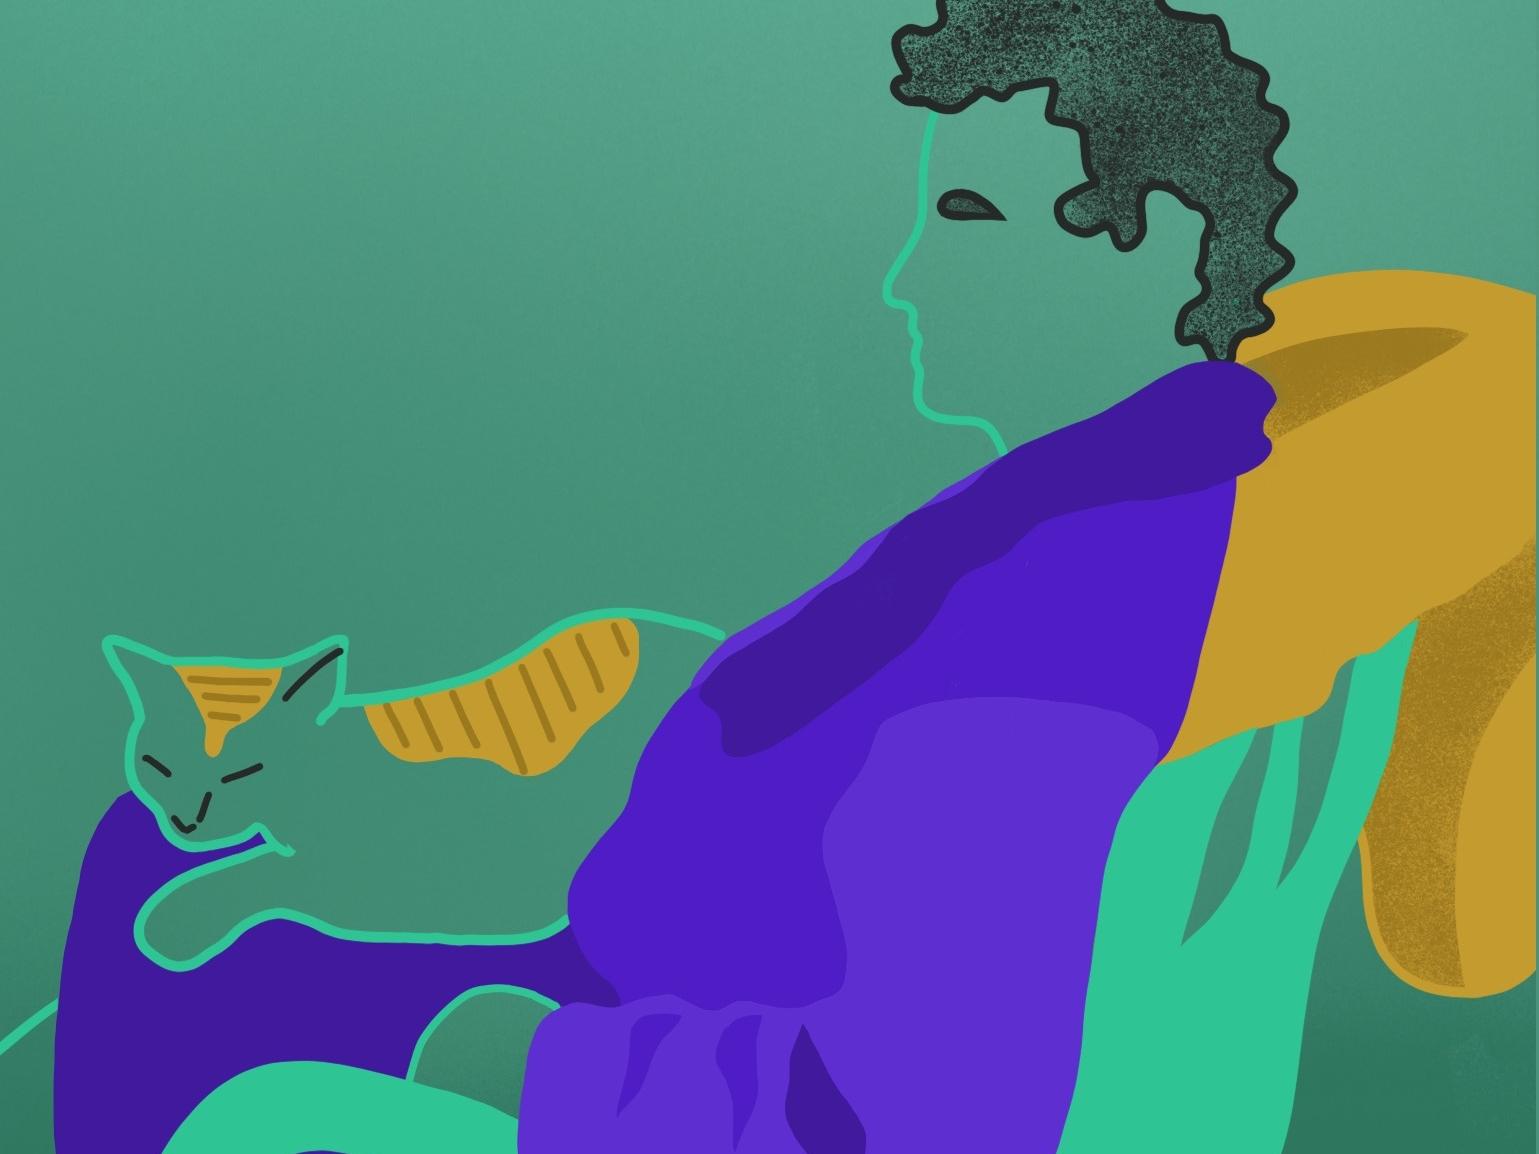 island man island cat adobe draw vector illustration procreate app procreate digital illustrator digital illustration illustration vector sketch design colors